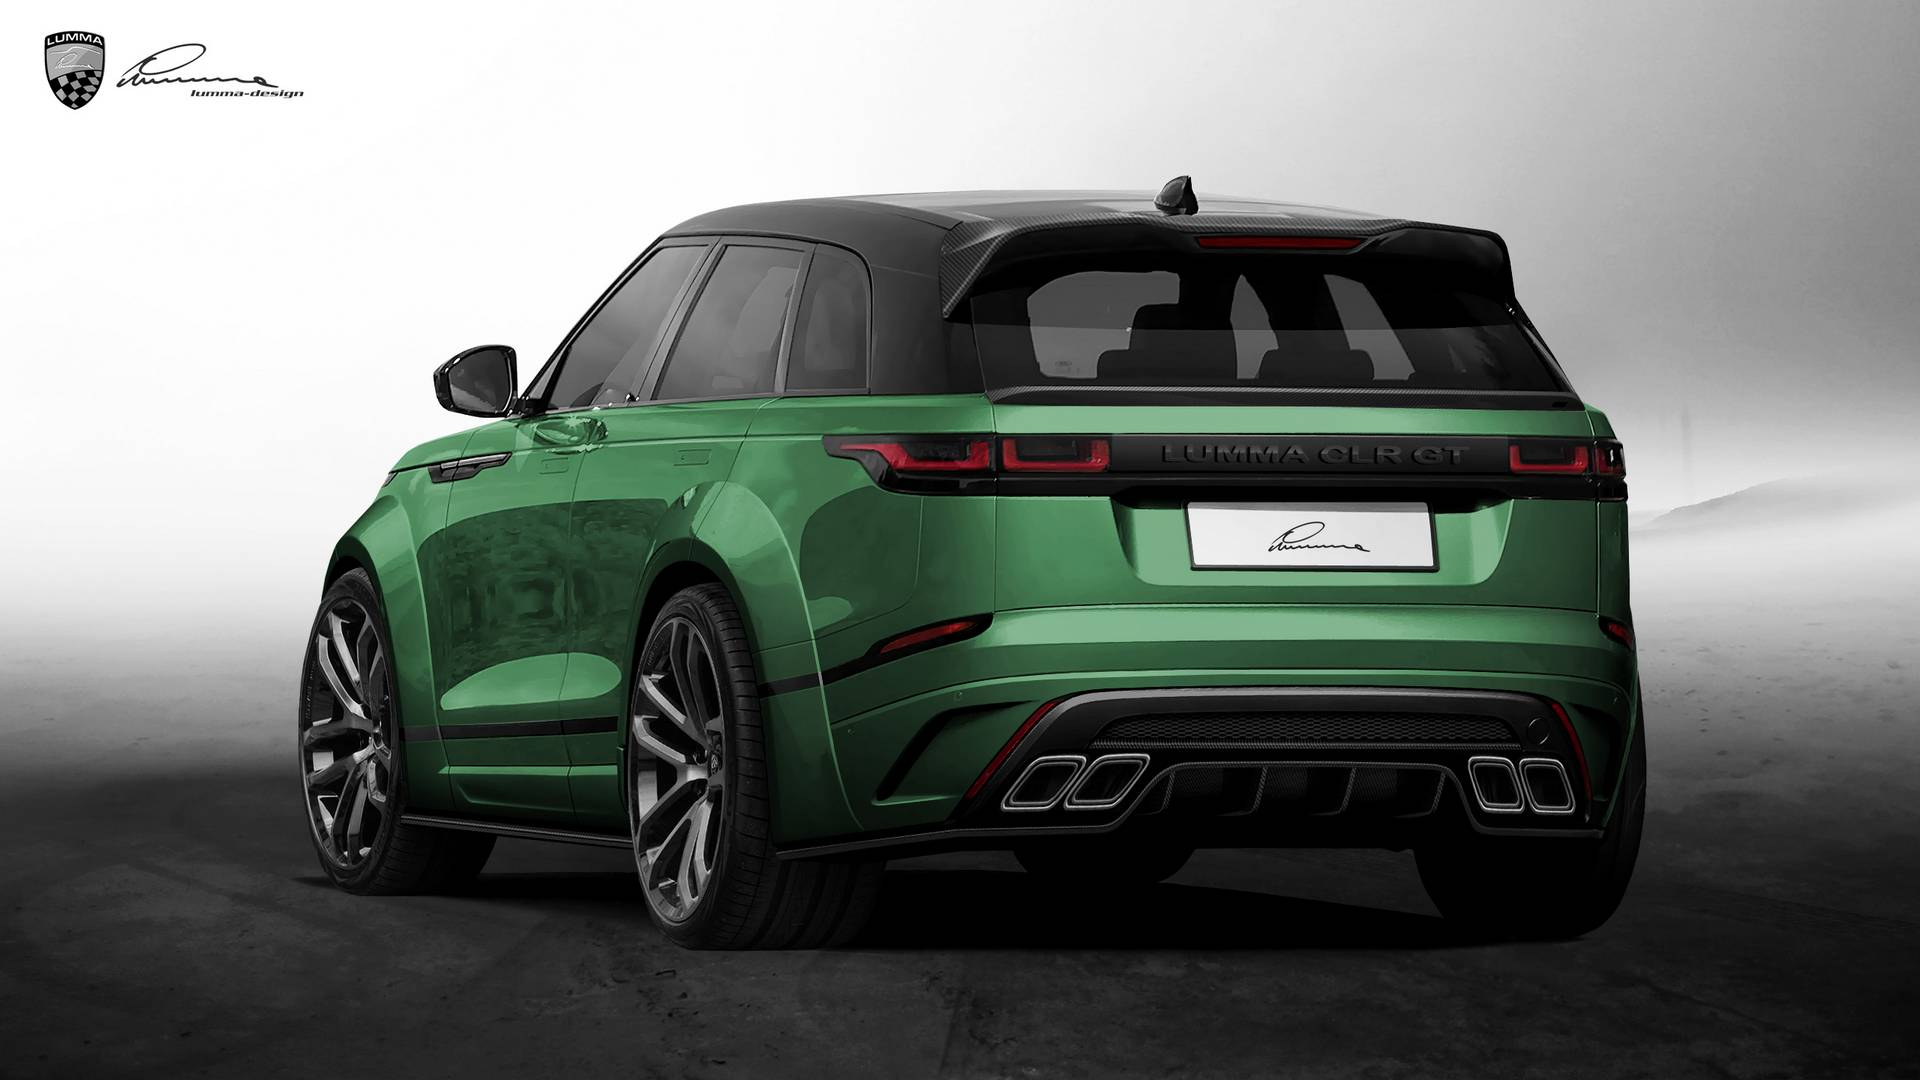 ficial Lumma Design Range Rover Velar CLR GT GTspirit